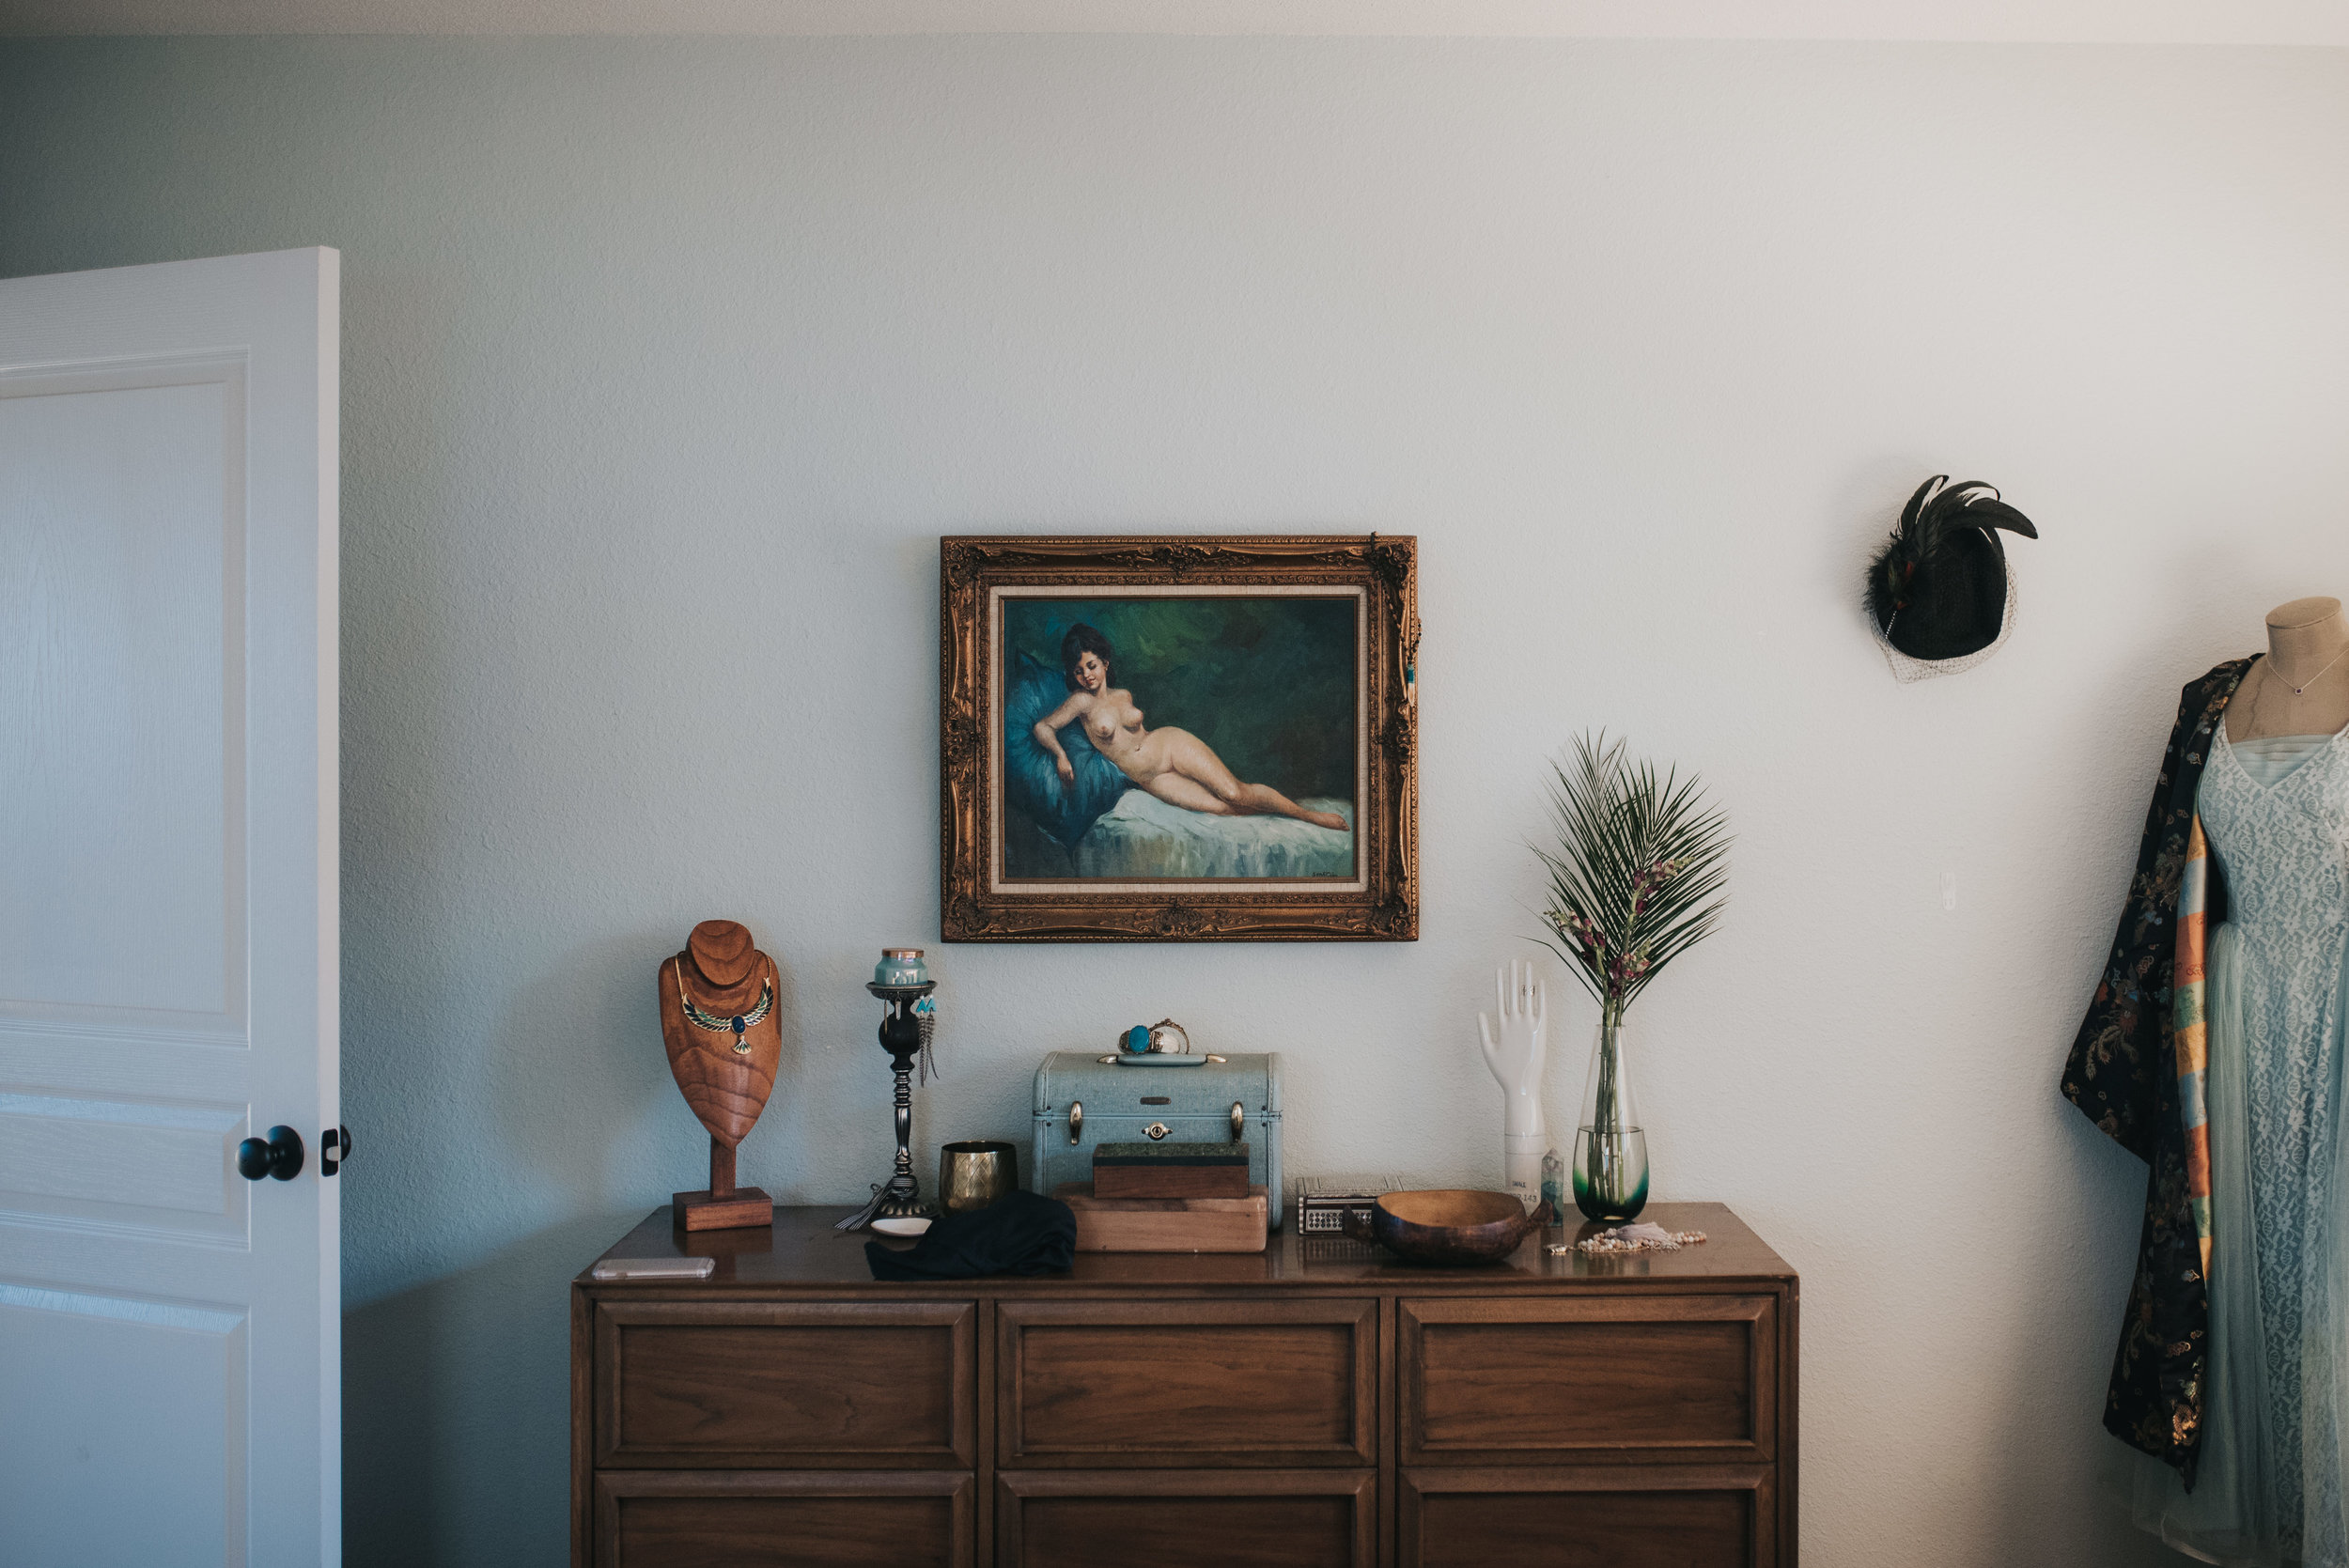 carissa-spencer-mid-century-editorial-in-home-couple-session-orlando-florida-288.jpg